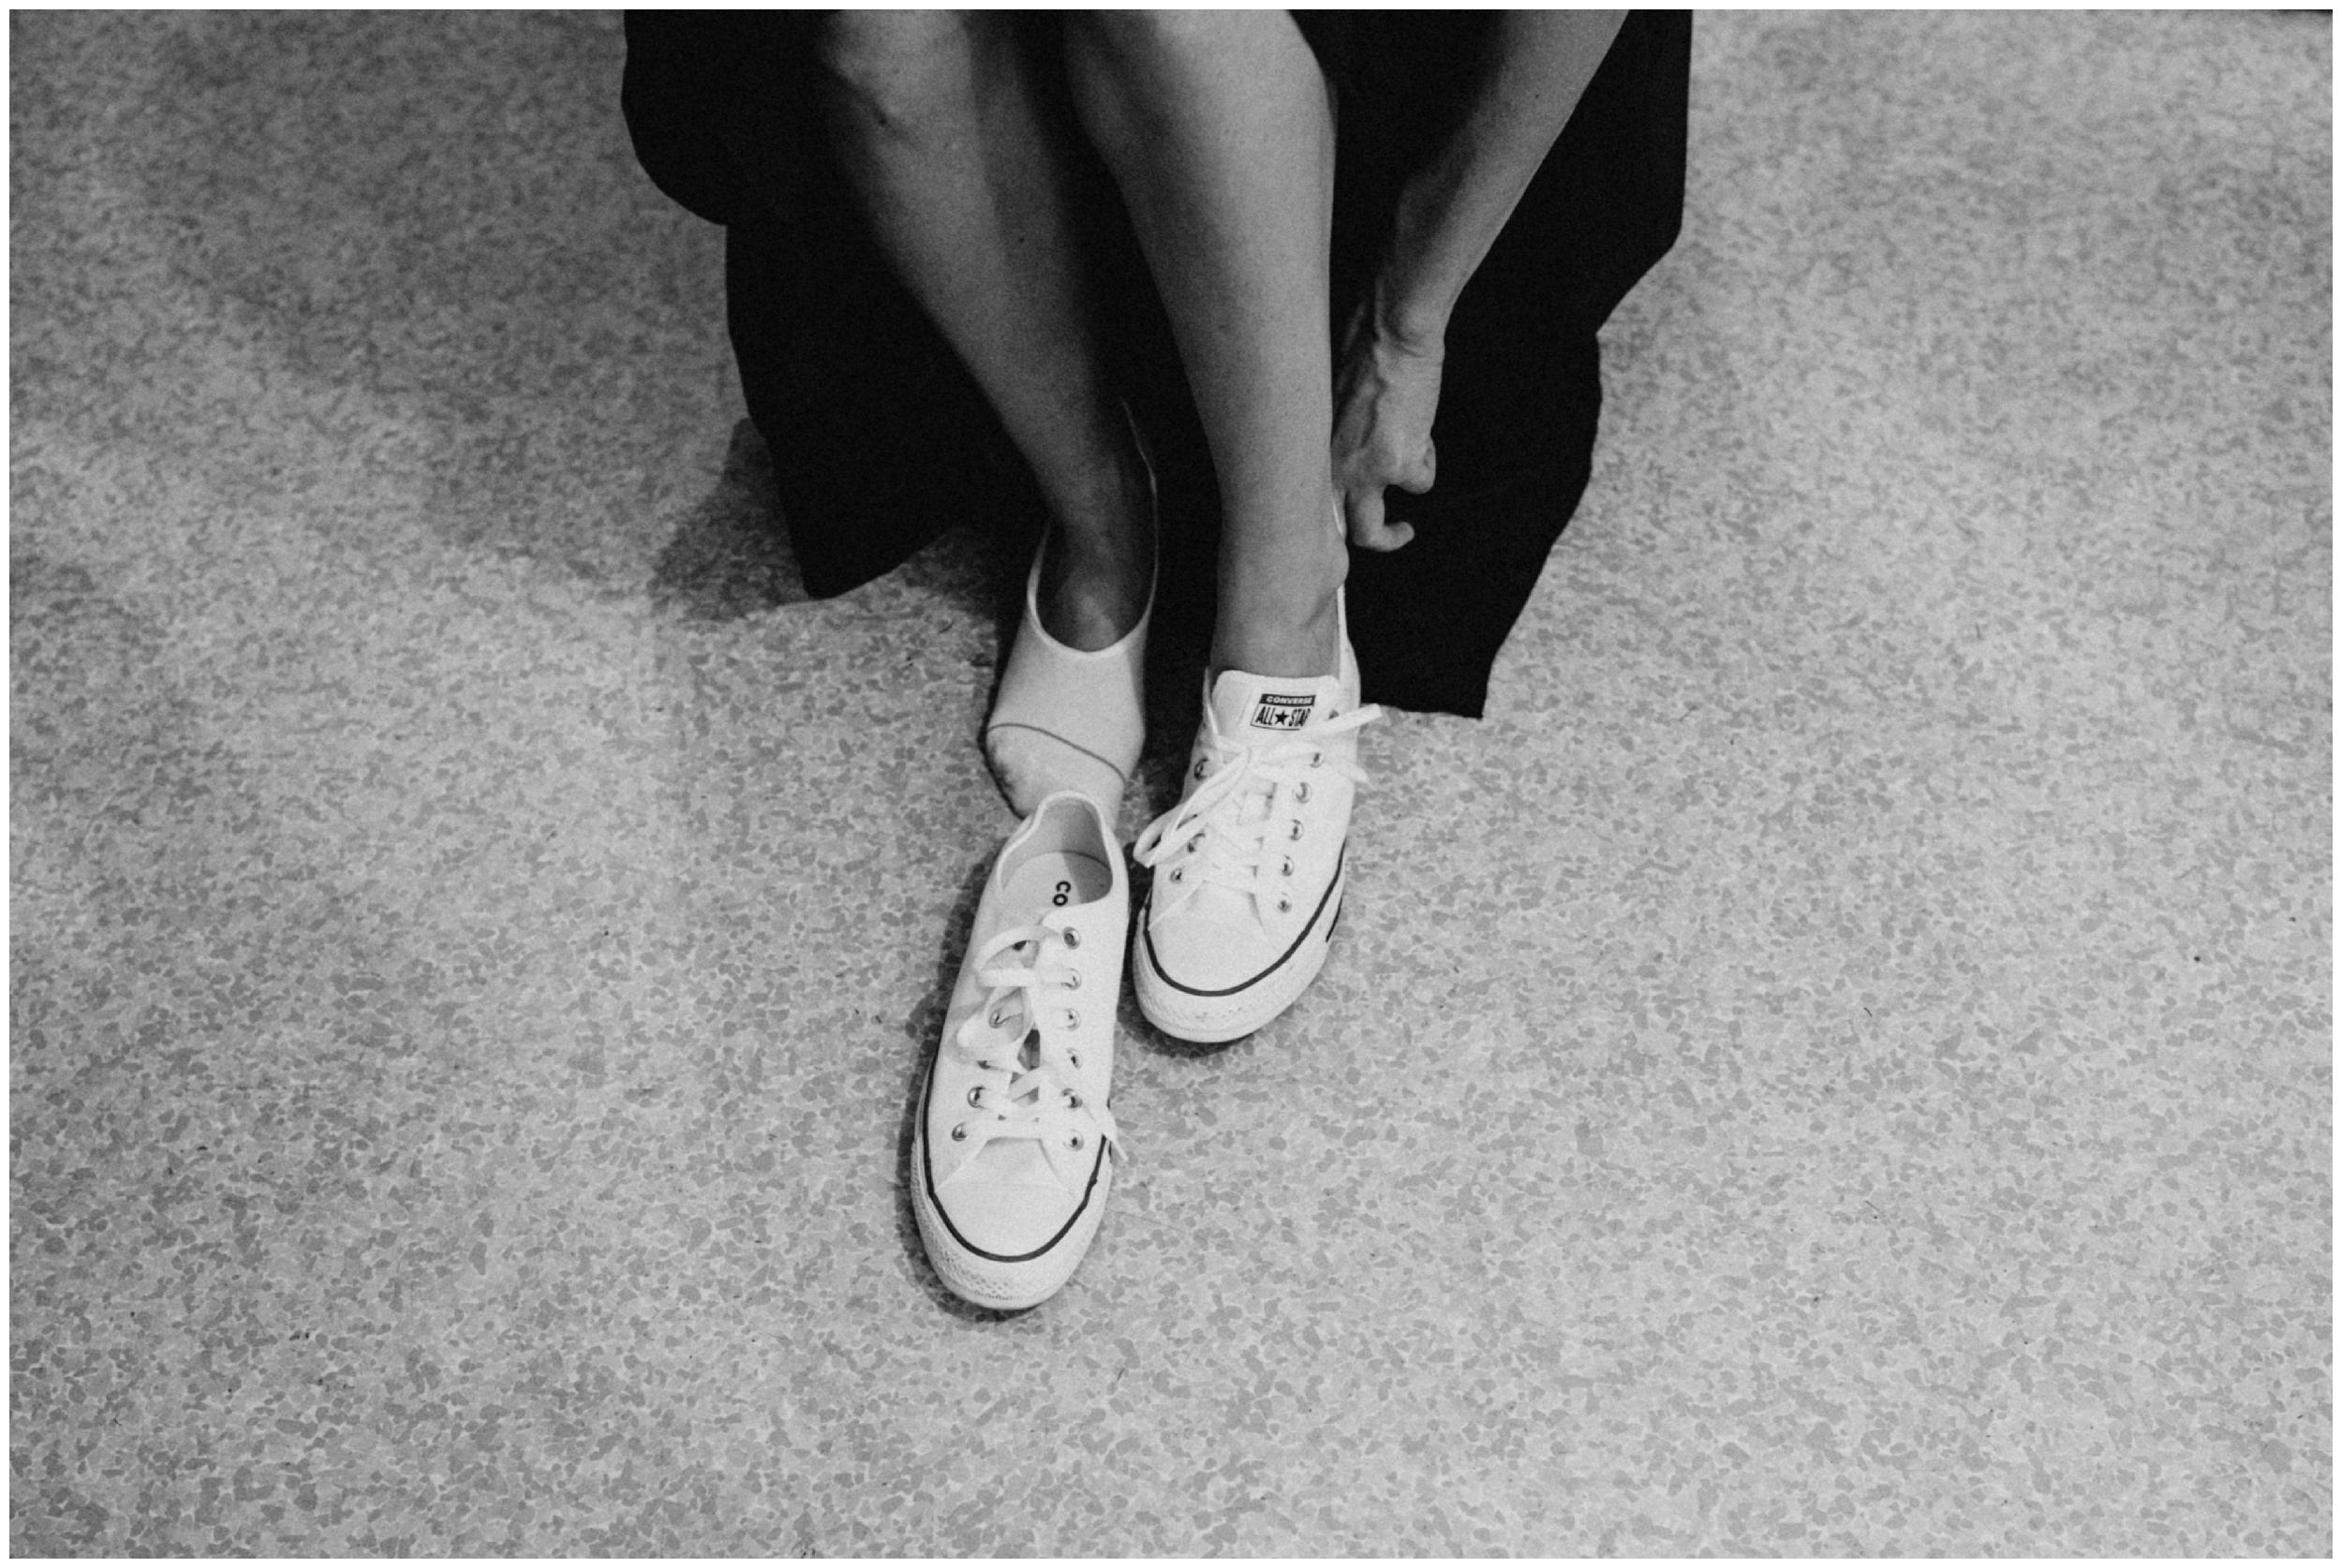 Bridesmaid wearing converse tennis shoes at causal, laid back Camp Foley wedding